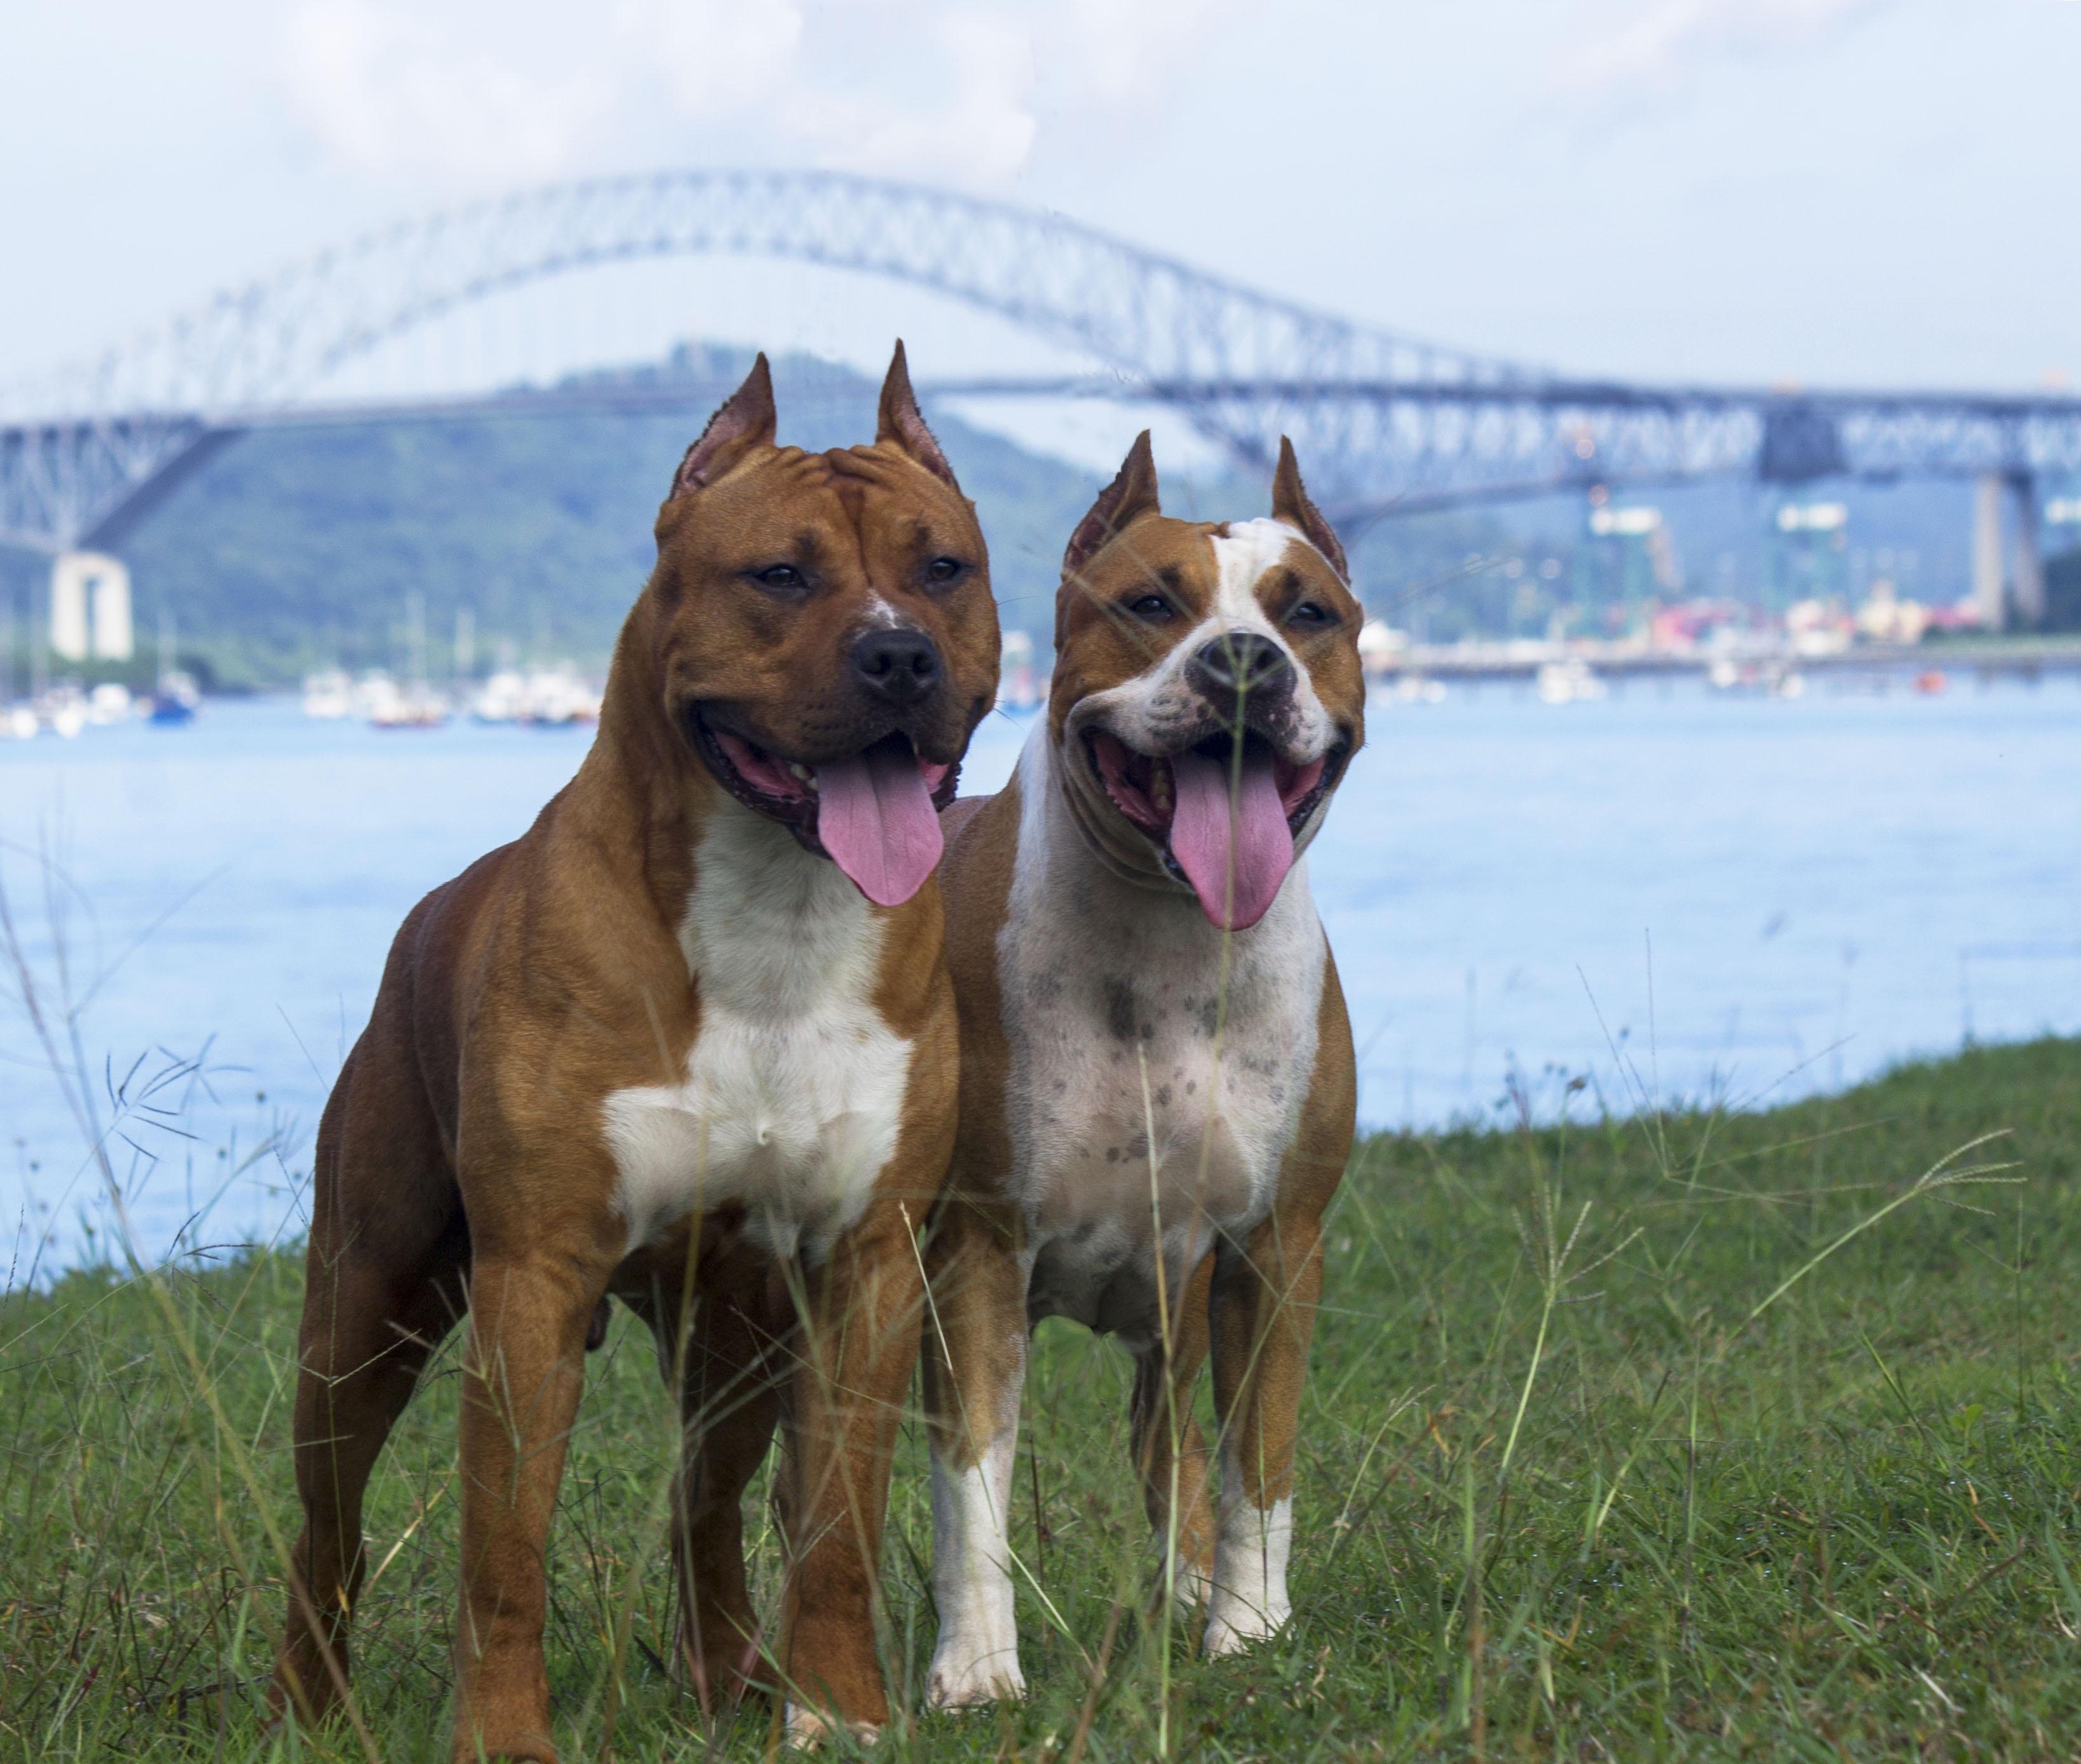 Free Images People Bridge Pets Dogs Happy Animals Vertebrate